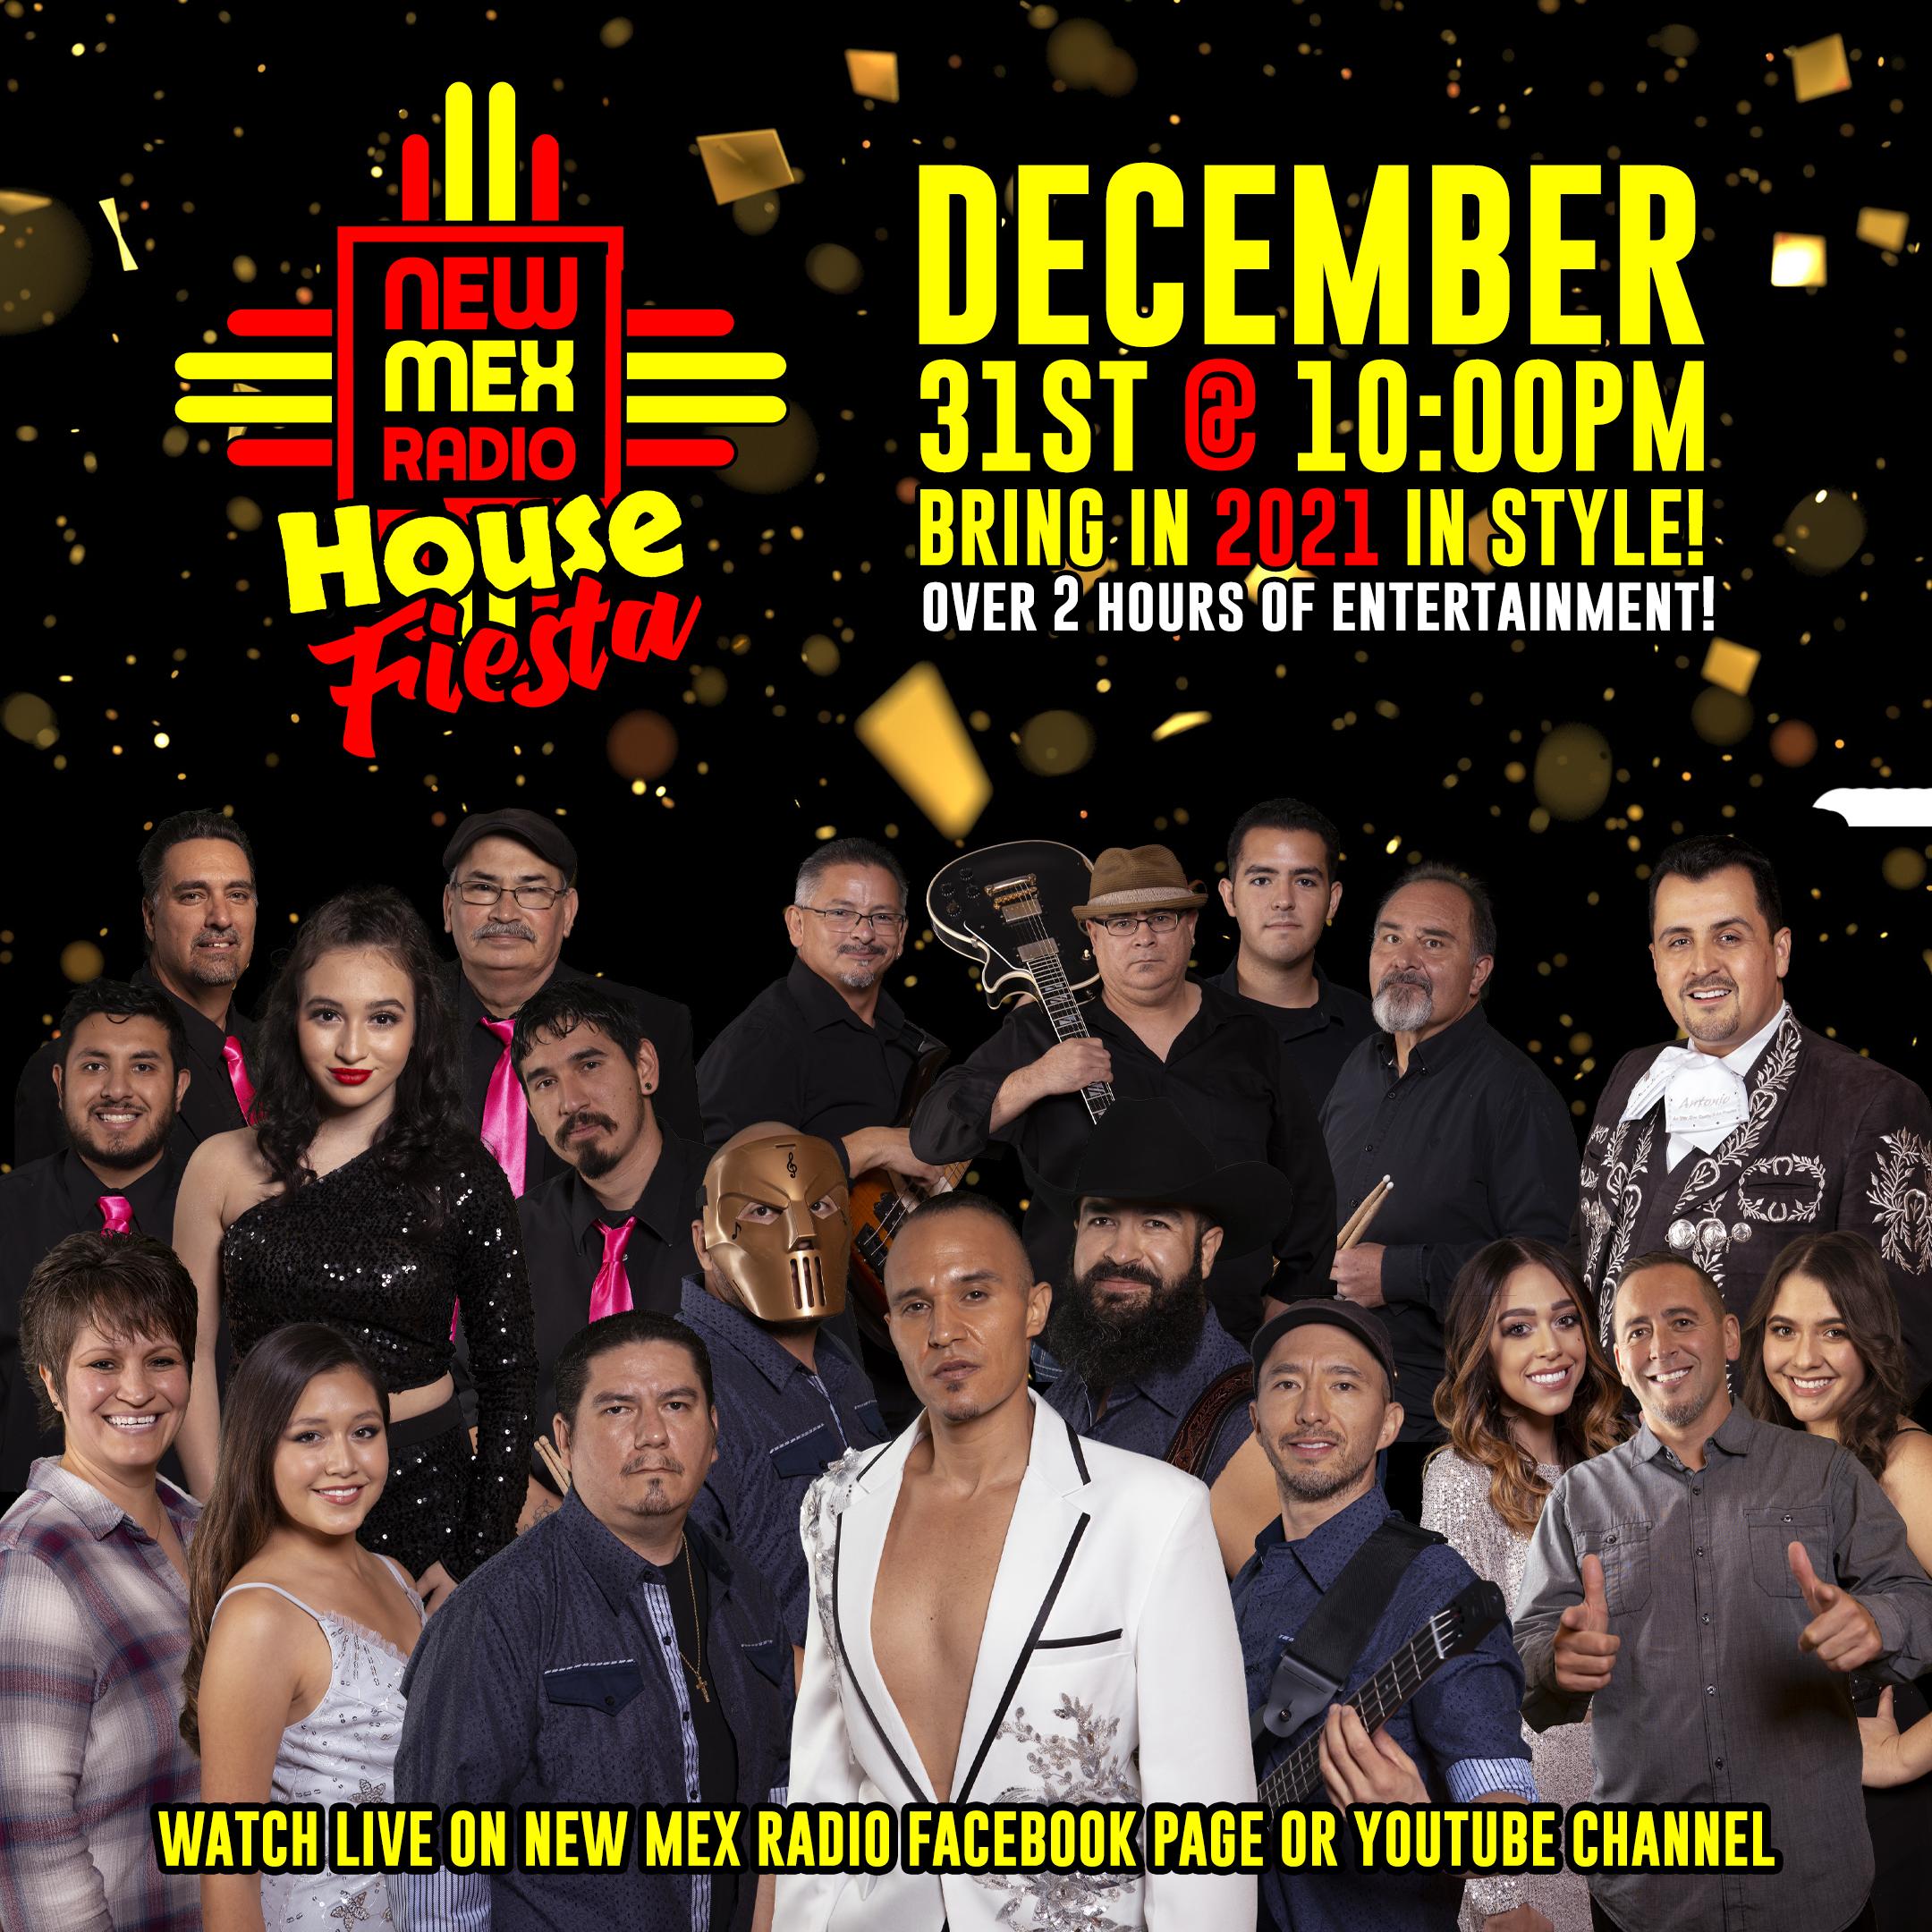 New Mex Radio House Fiesta Poster